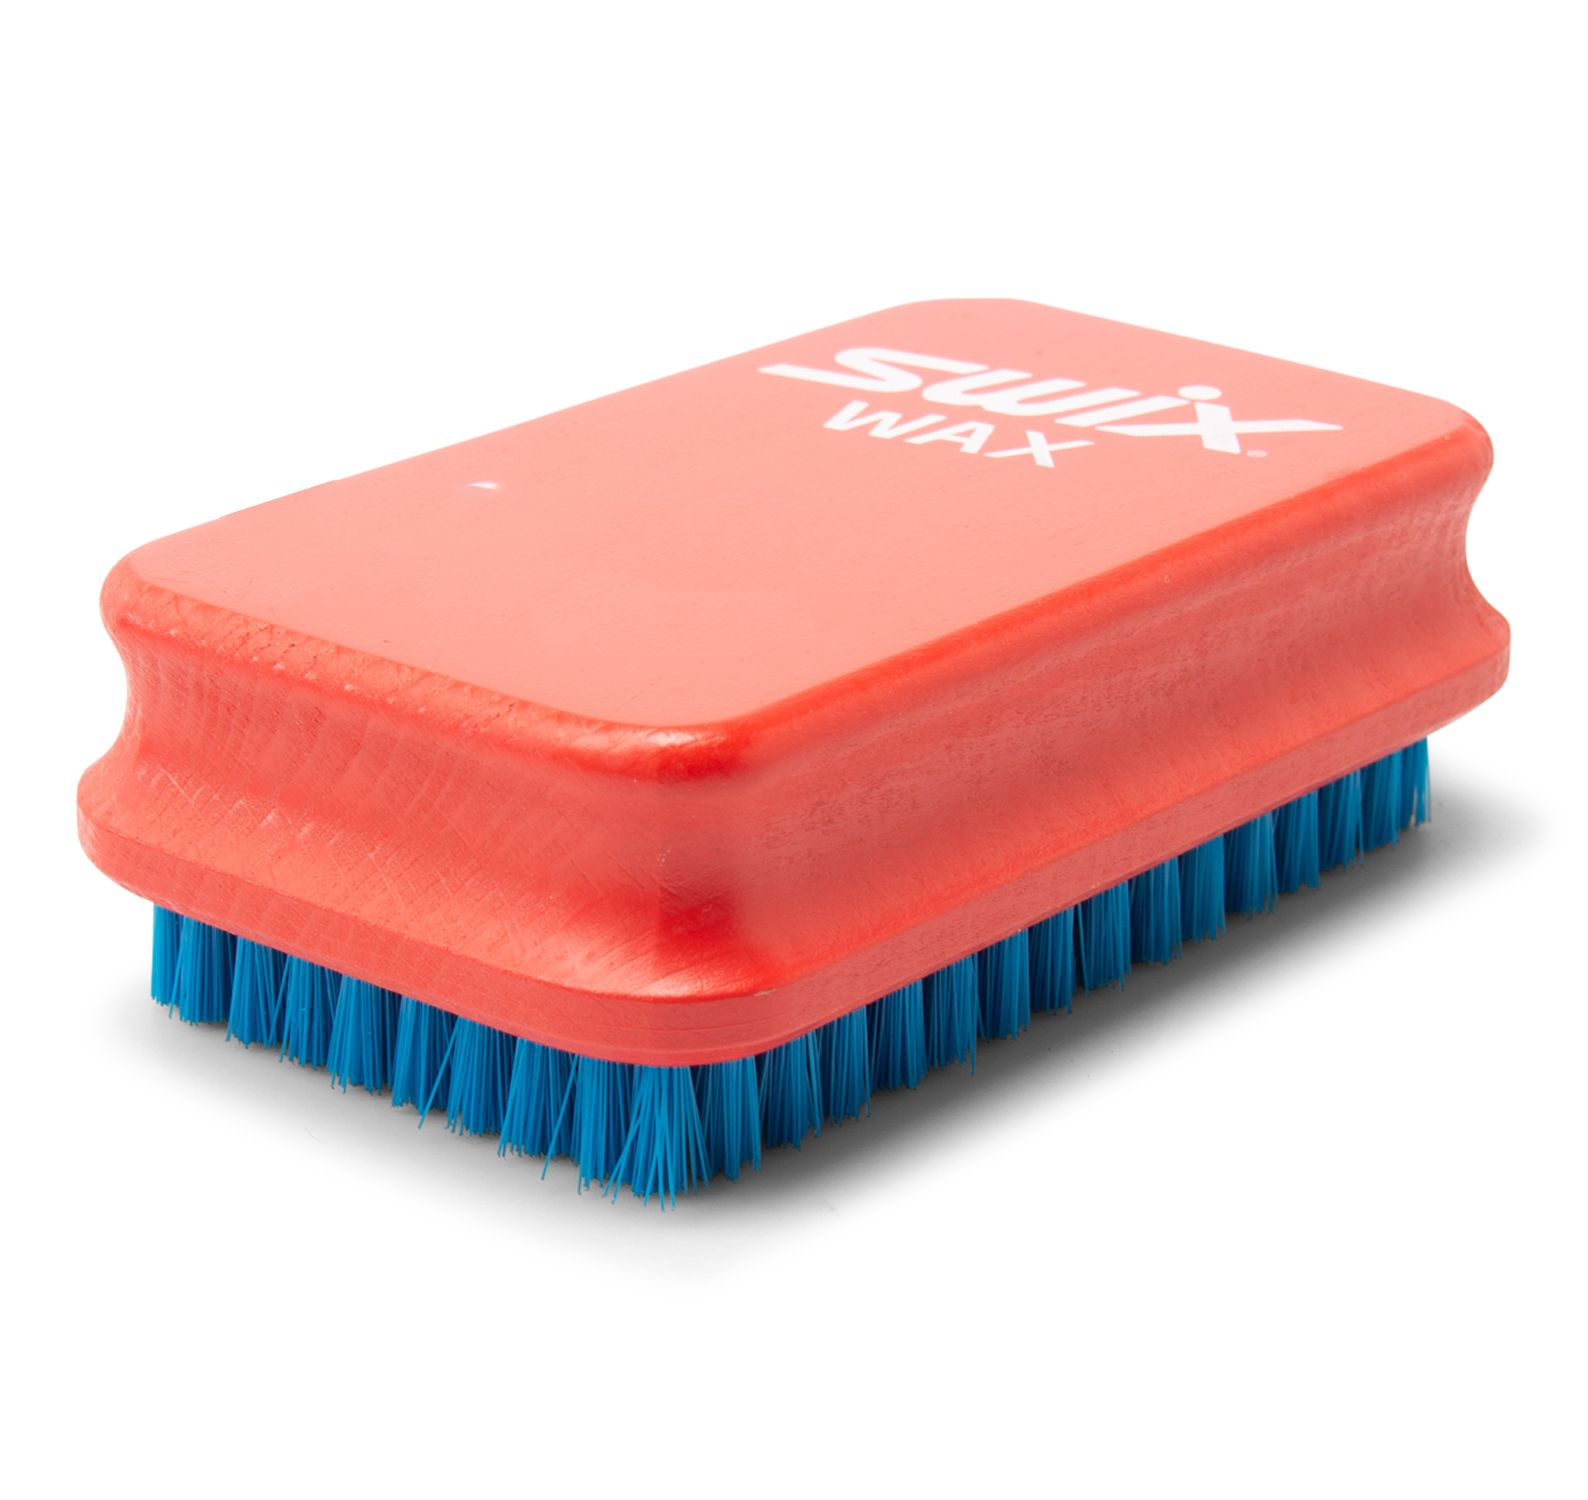 T159b Brush Rect,Combi Bron./N, Unspecified, 57,  Swix